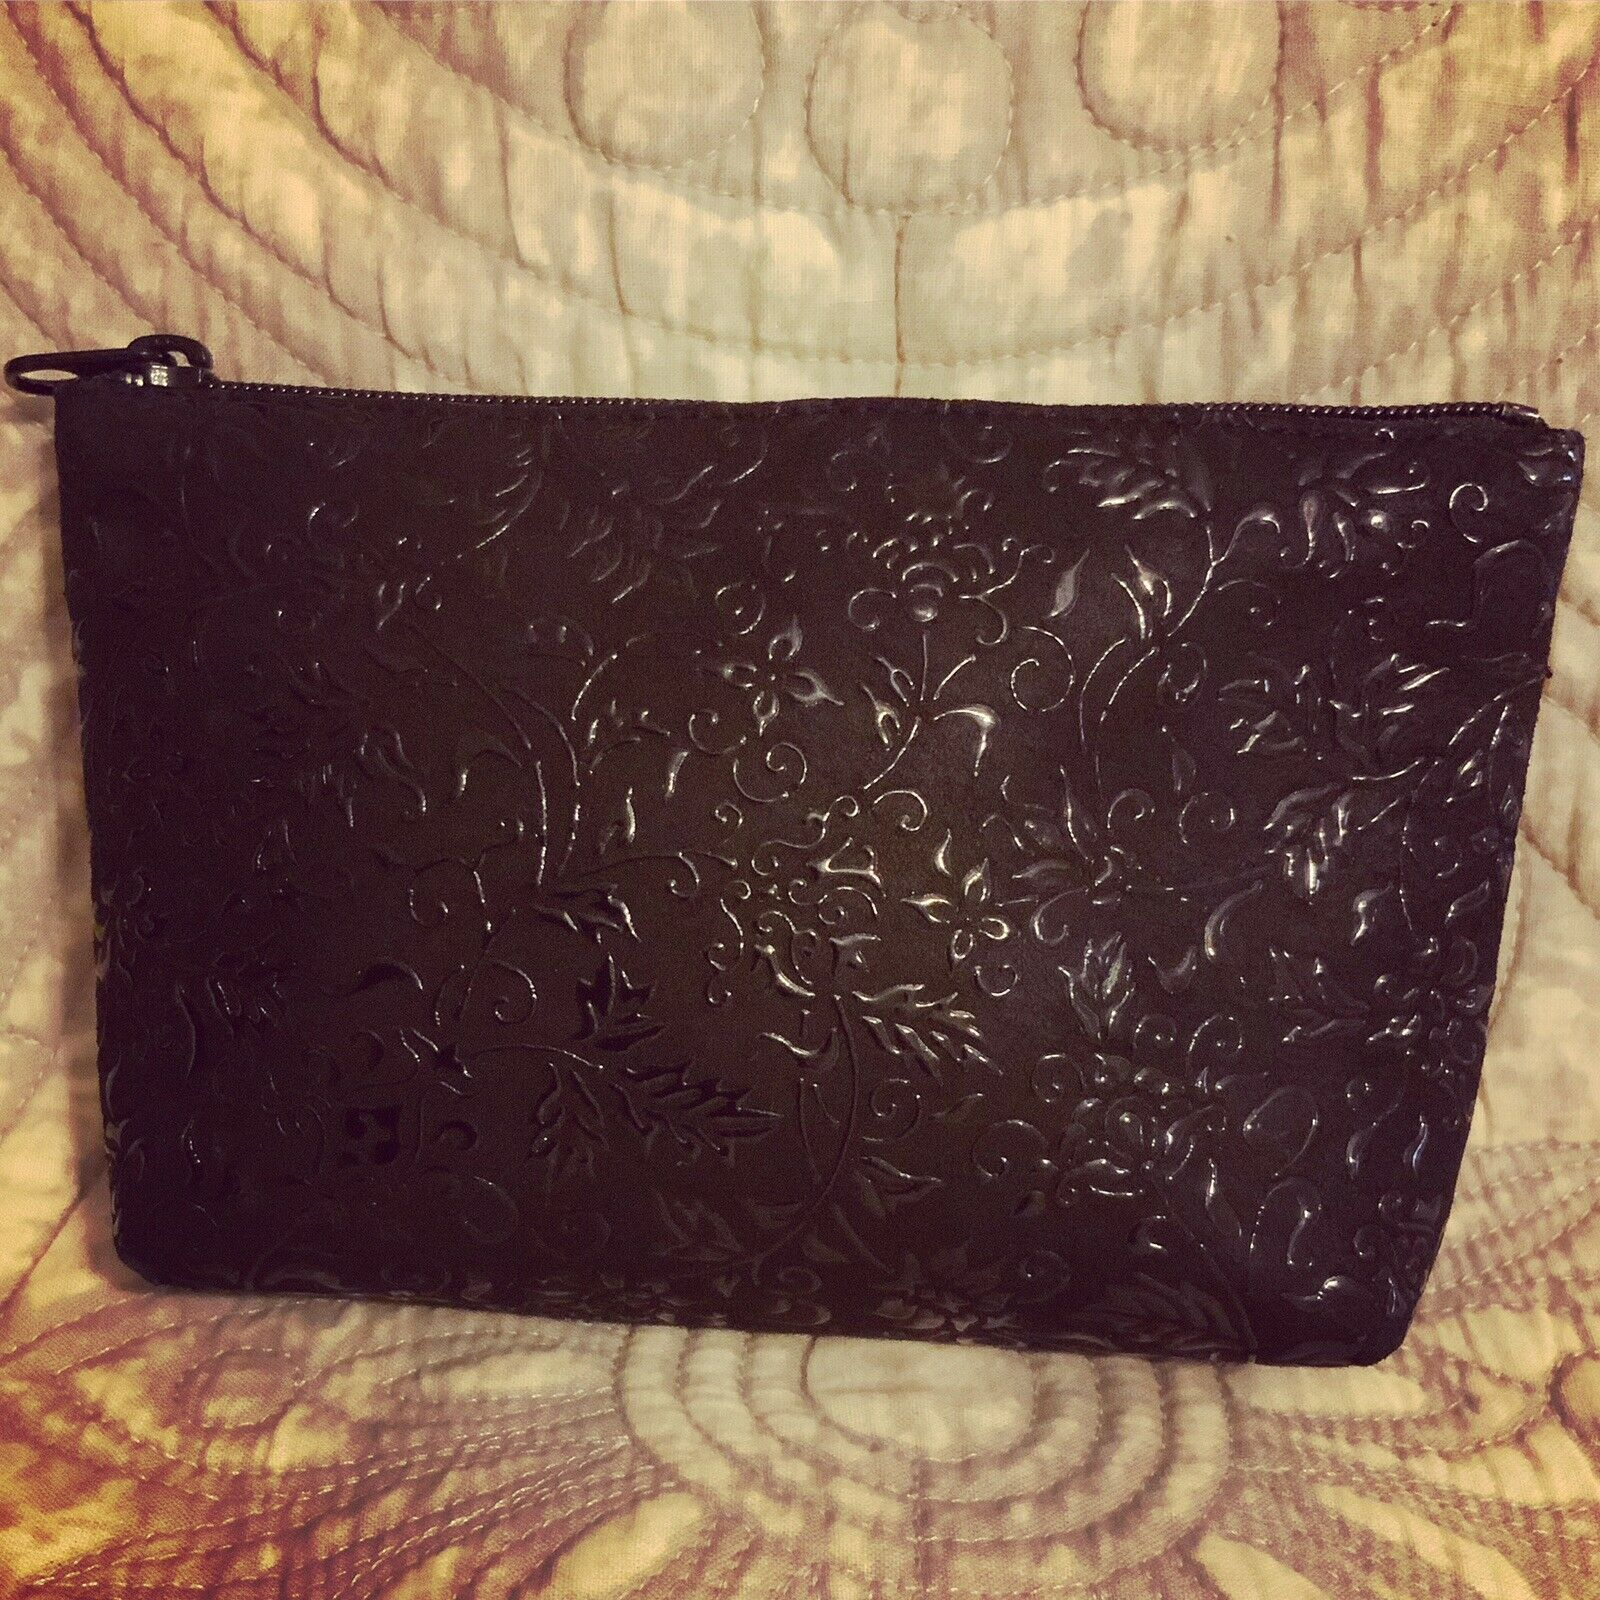 A Very Cool Beautiful Black Iden-ya Small Zip Bag